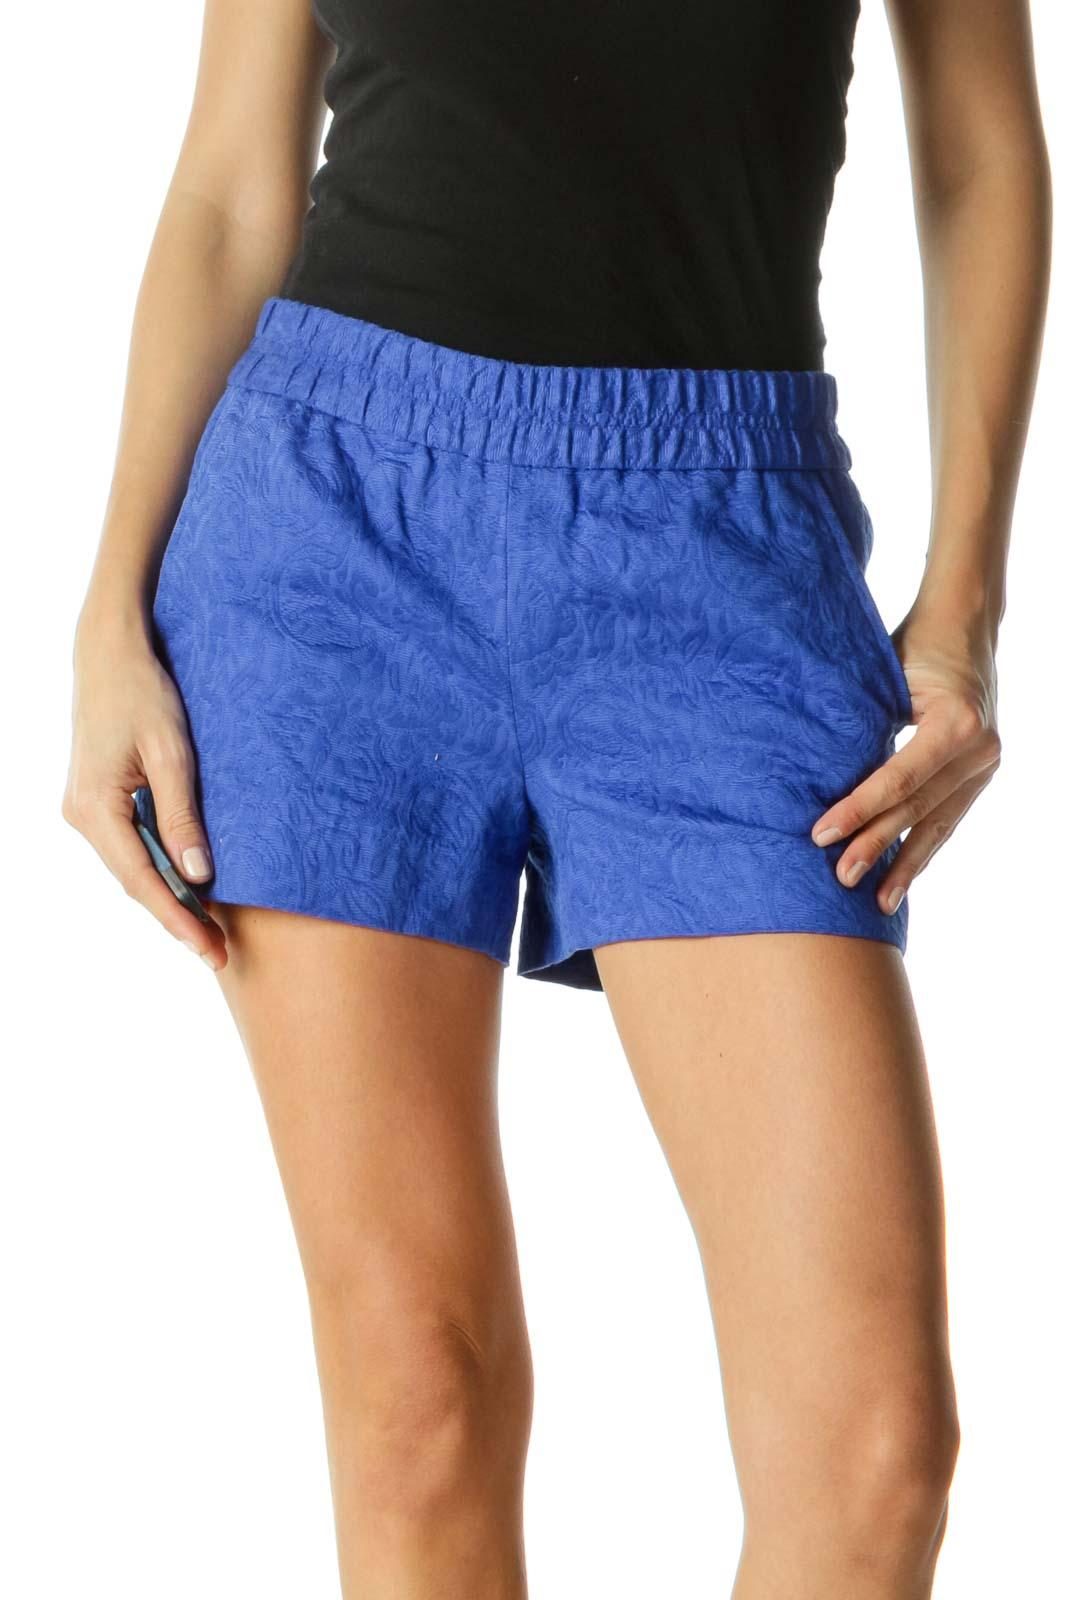 Blue Patterned Textured Short